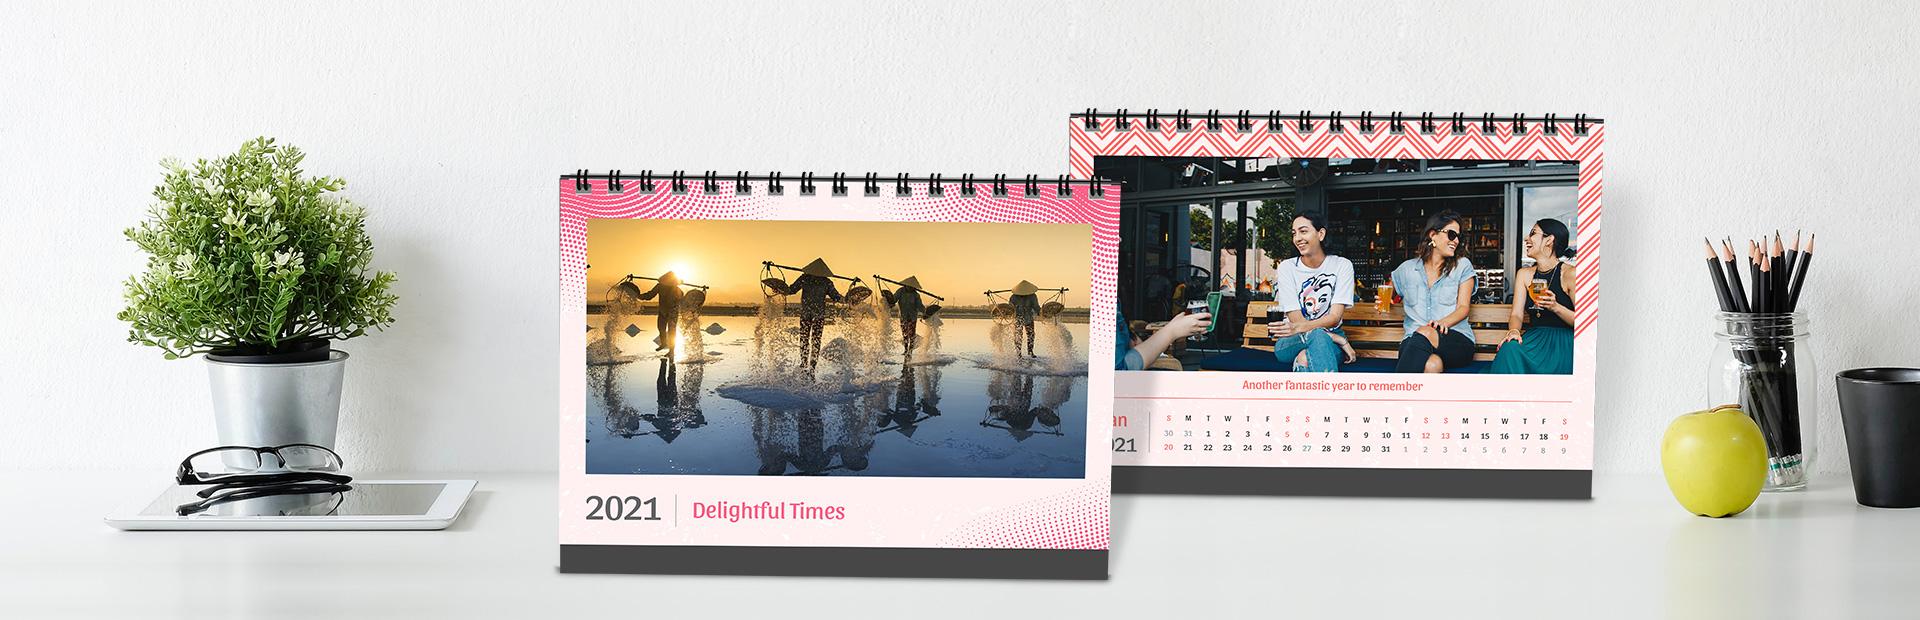 Ink It Classy Photo Calendars Online